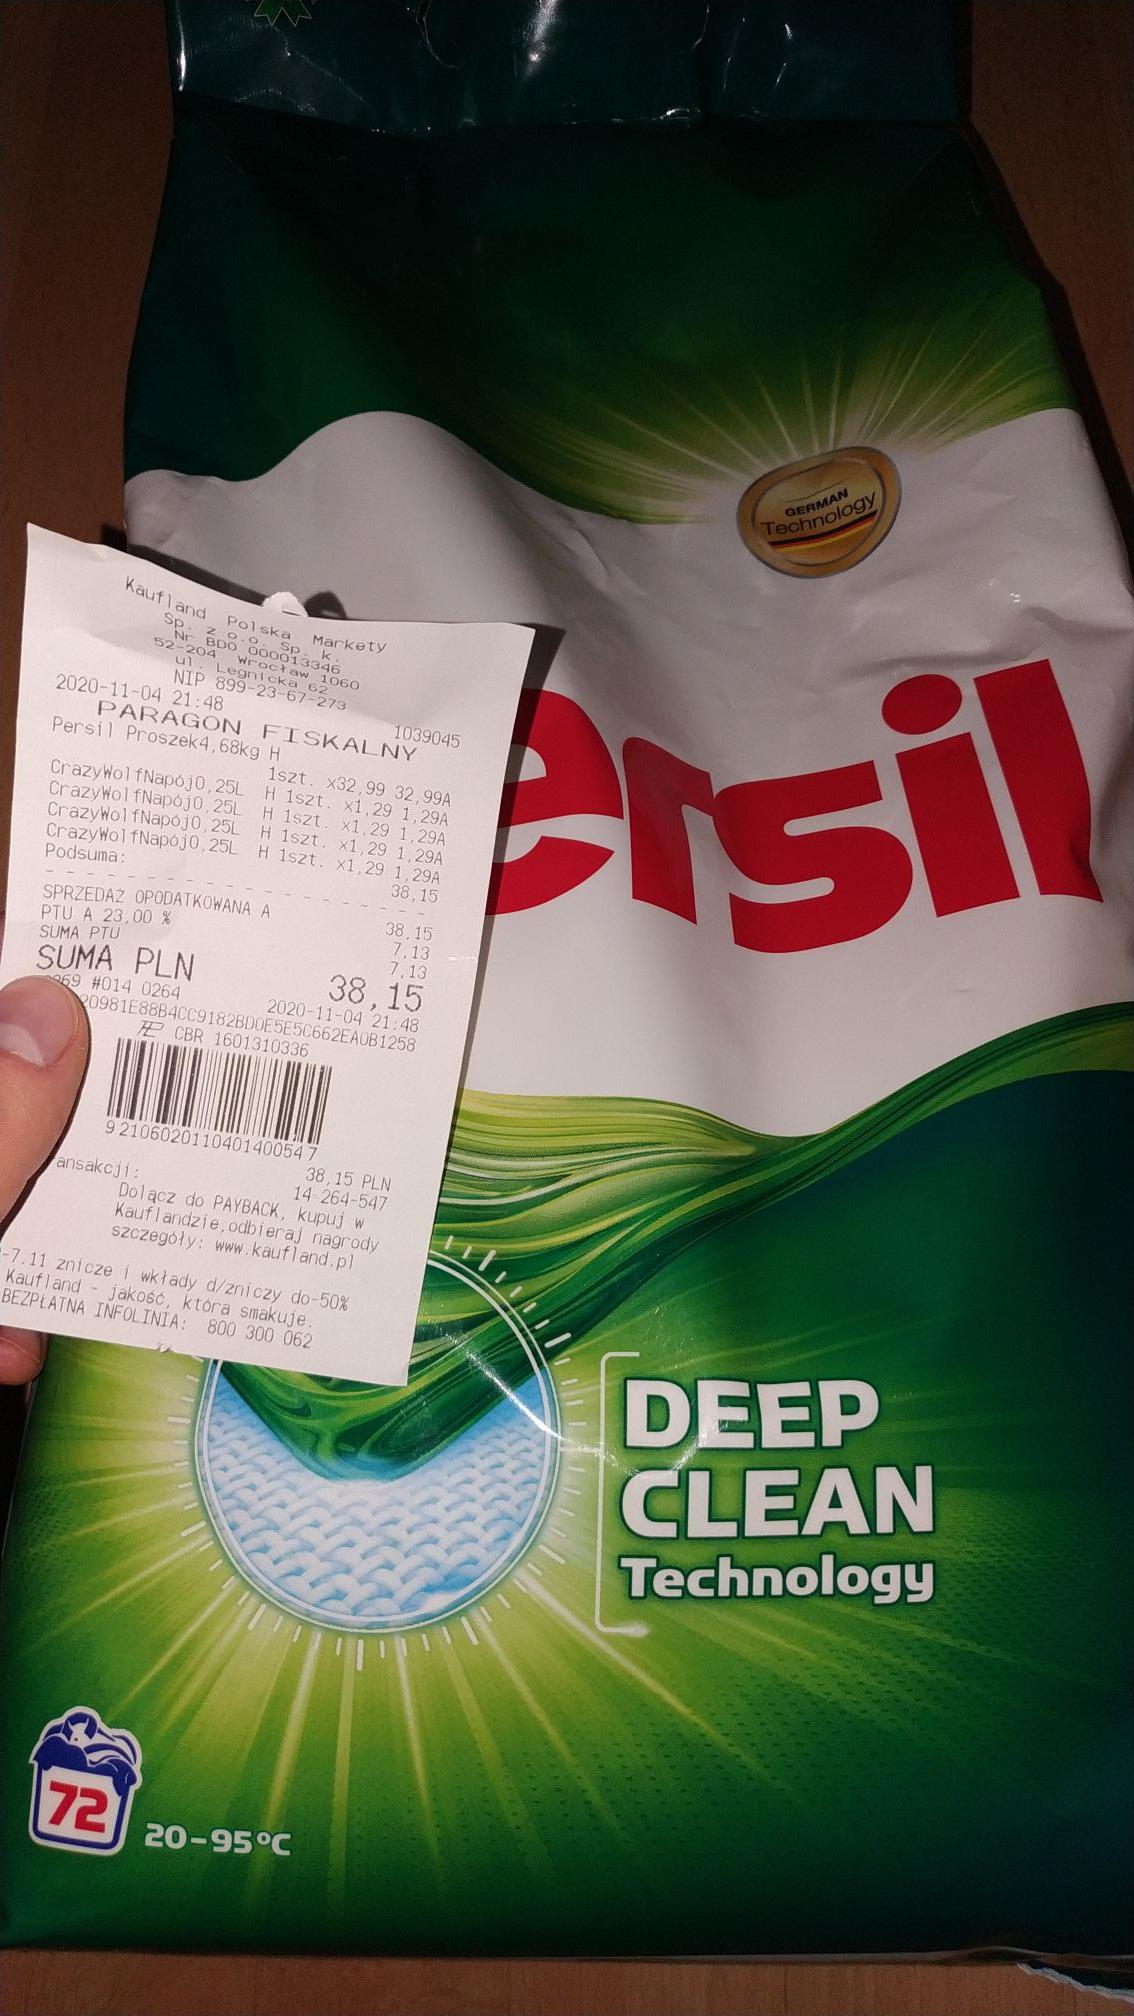 Proszek do prania Persil 4.68kg kaufland